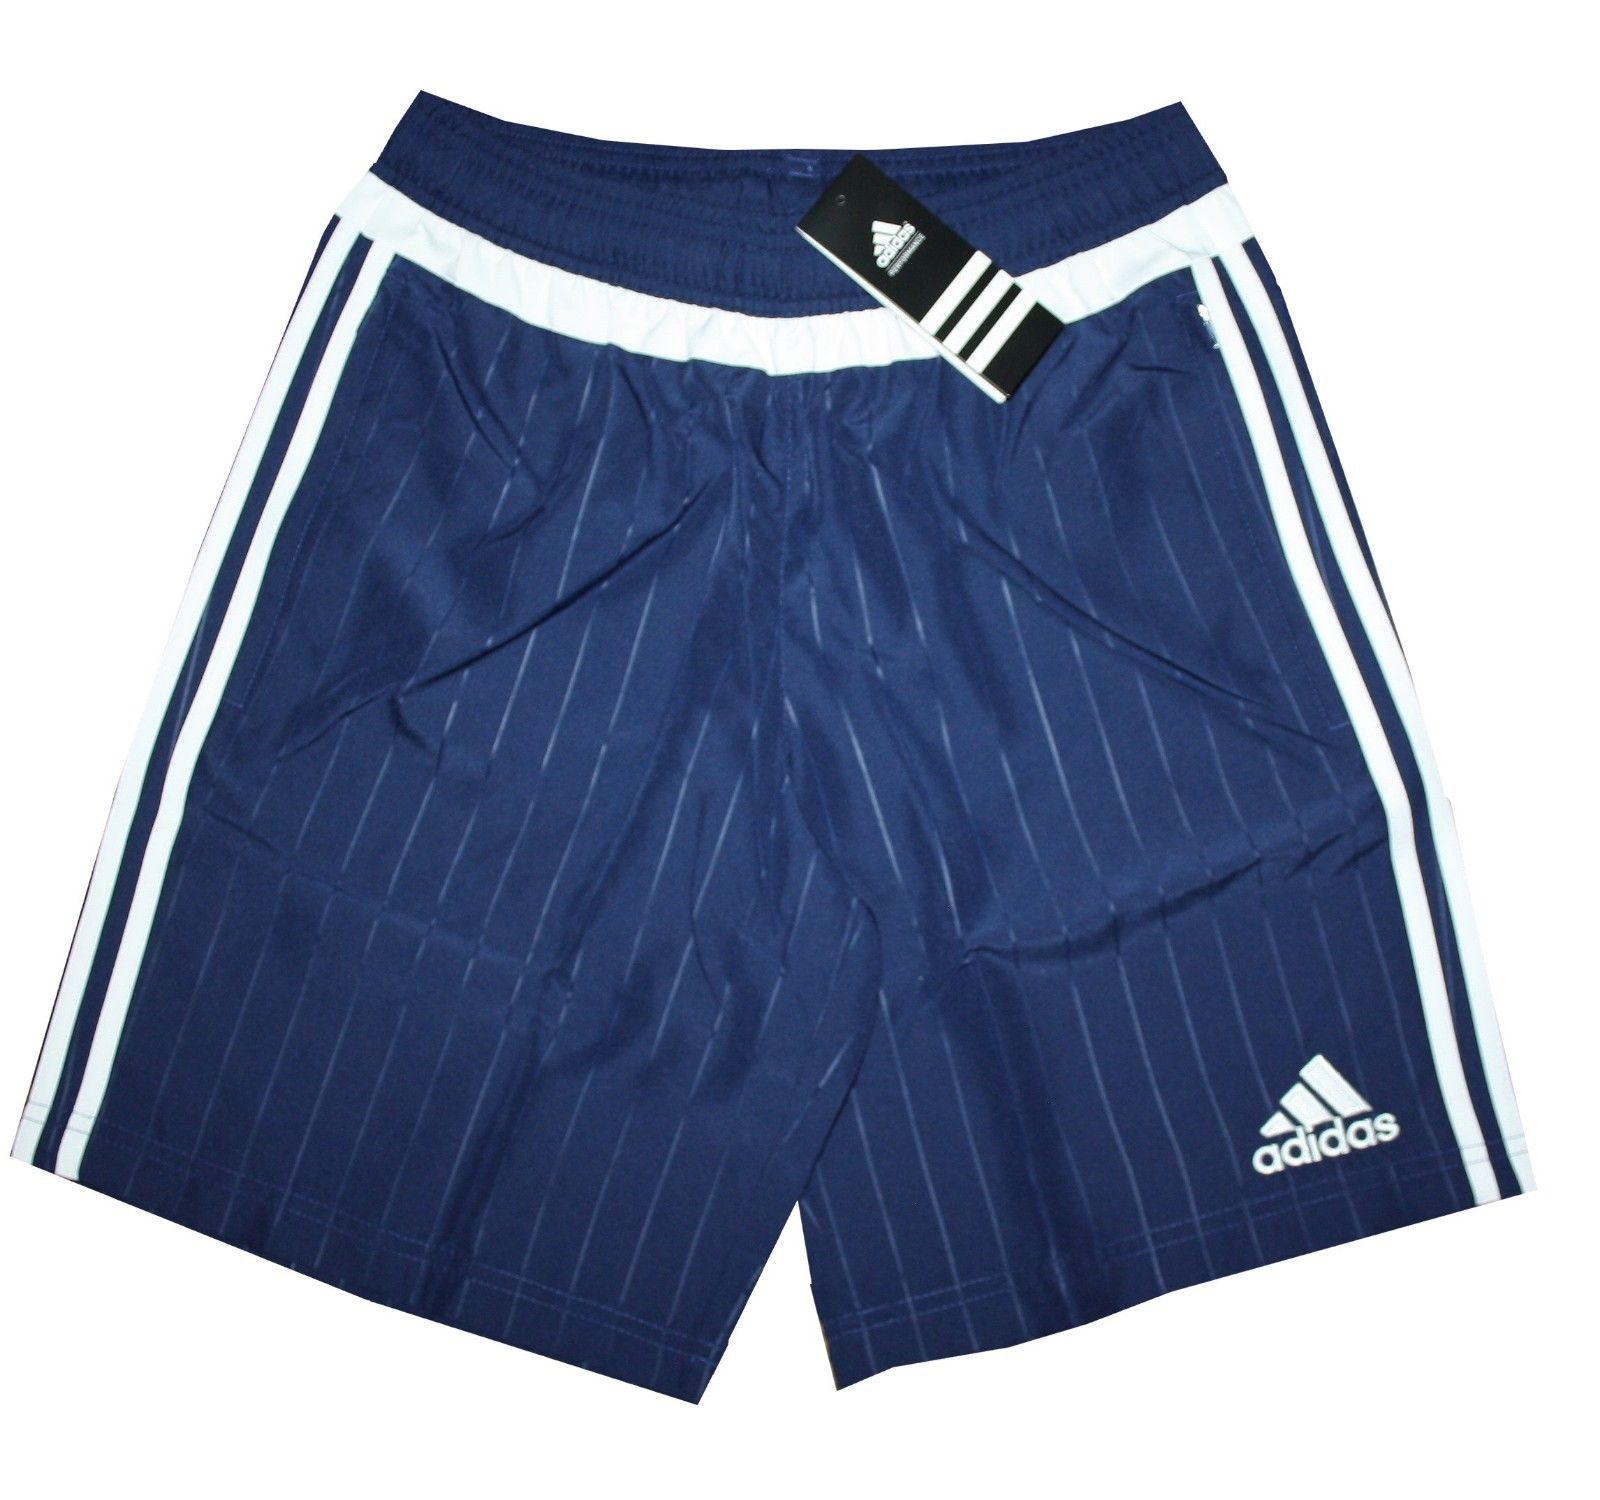 Adidas Tiro Jungen Sporthose Trainings Hose kurze Sommer Short Gr. 164 (S) blau